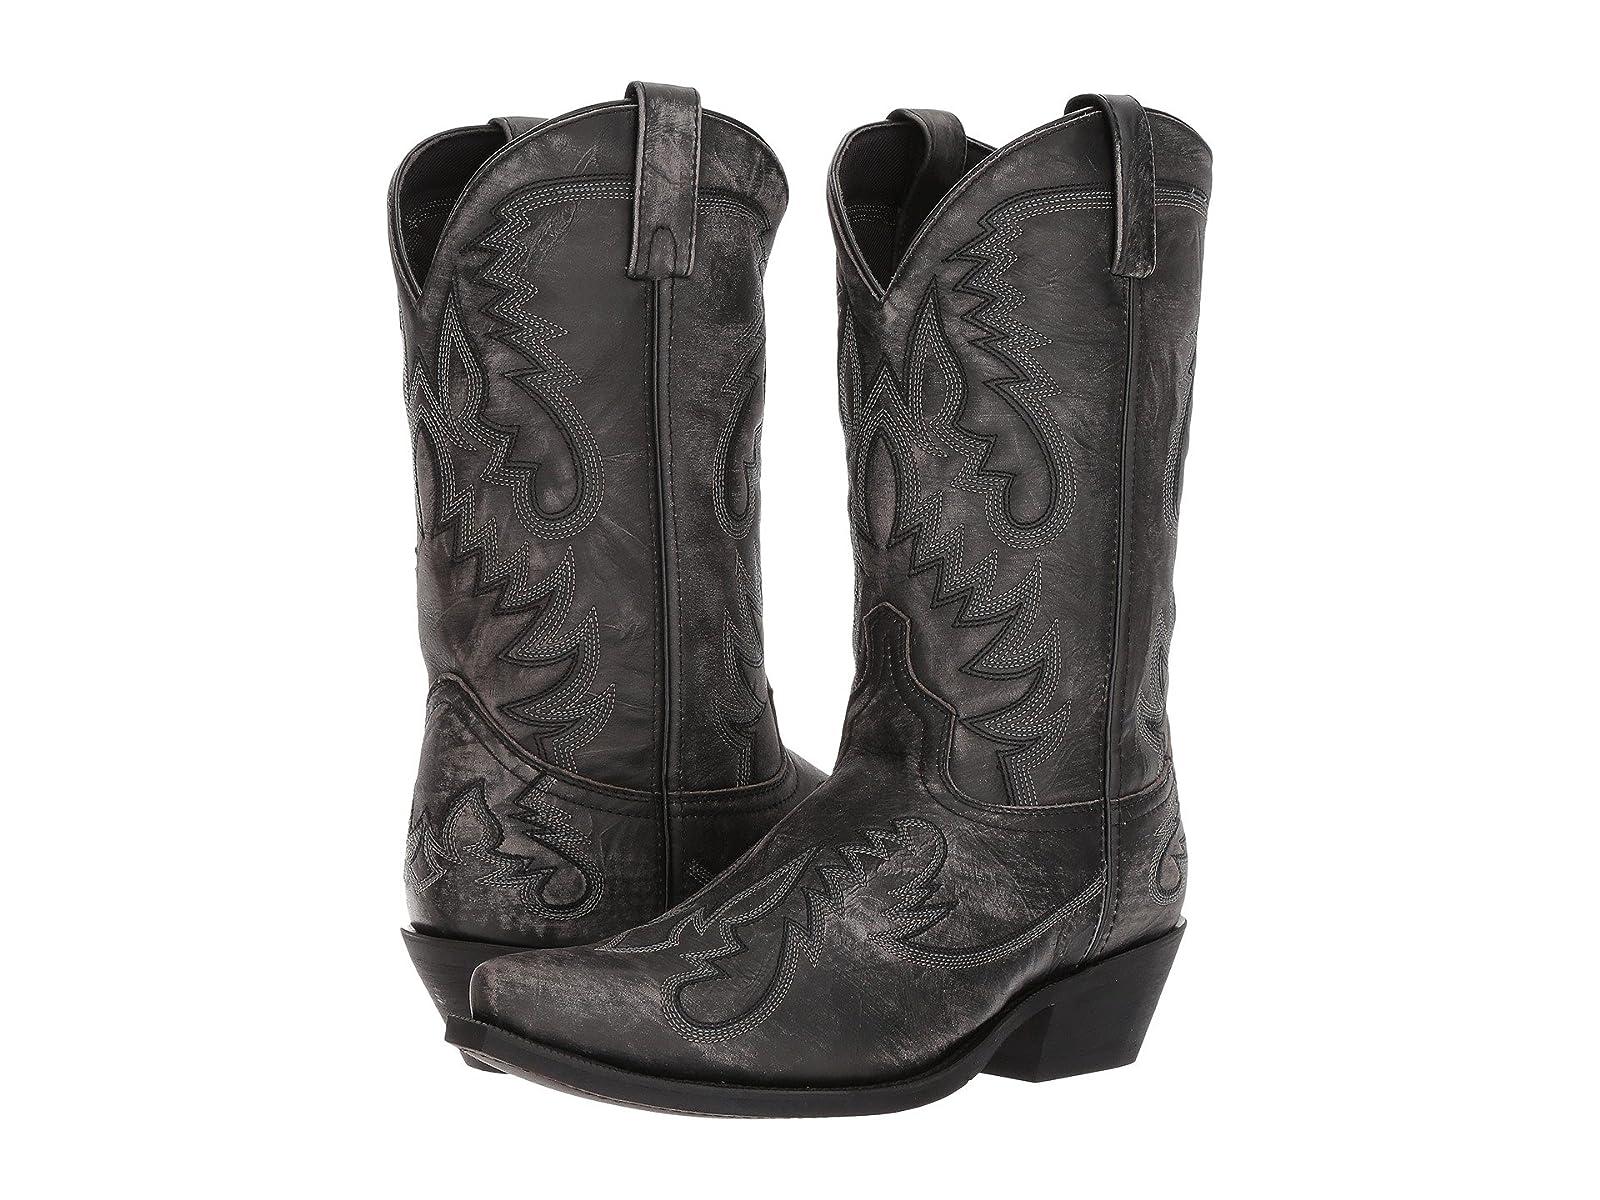 Laredo GarrettAffordable and distinctive shoes